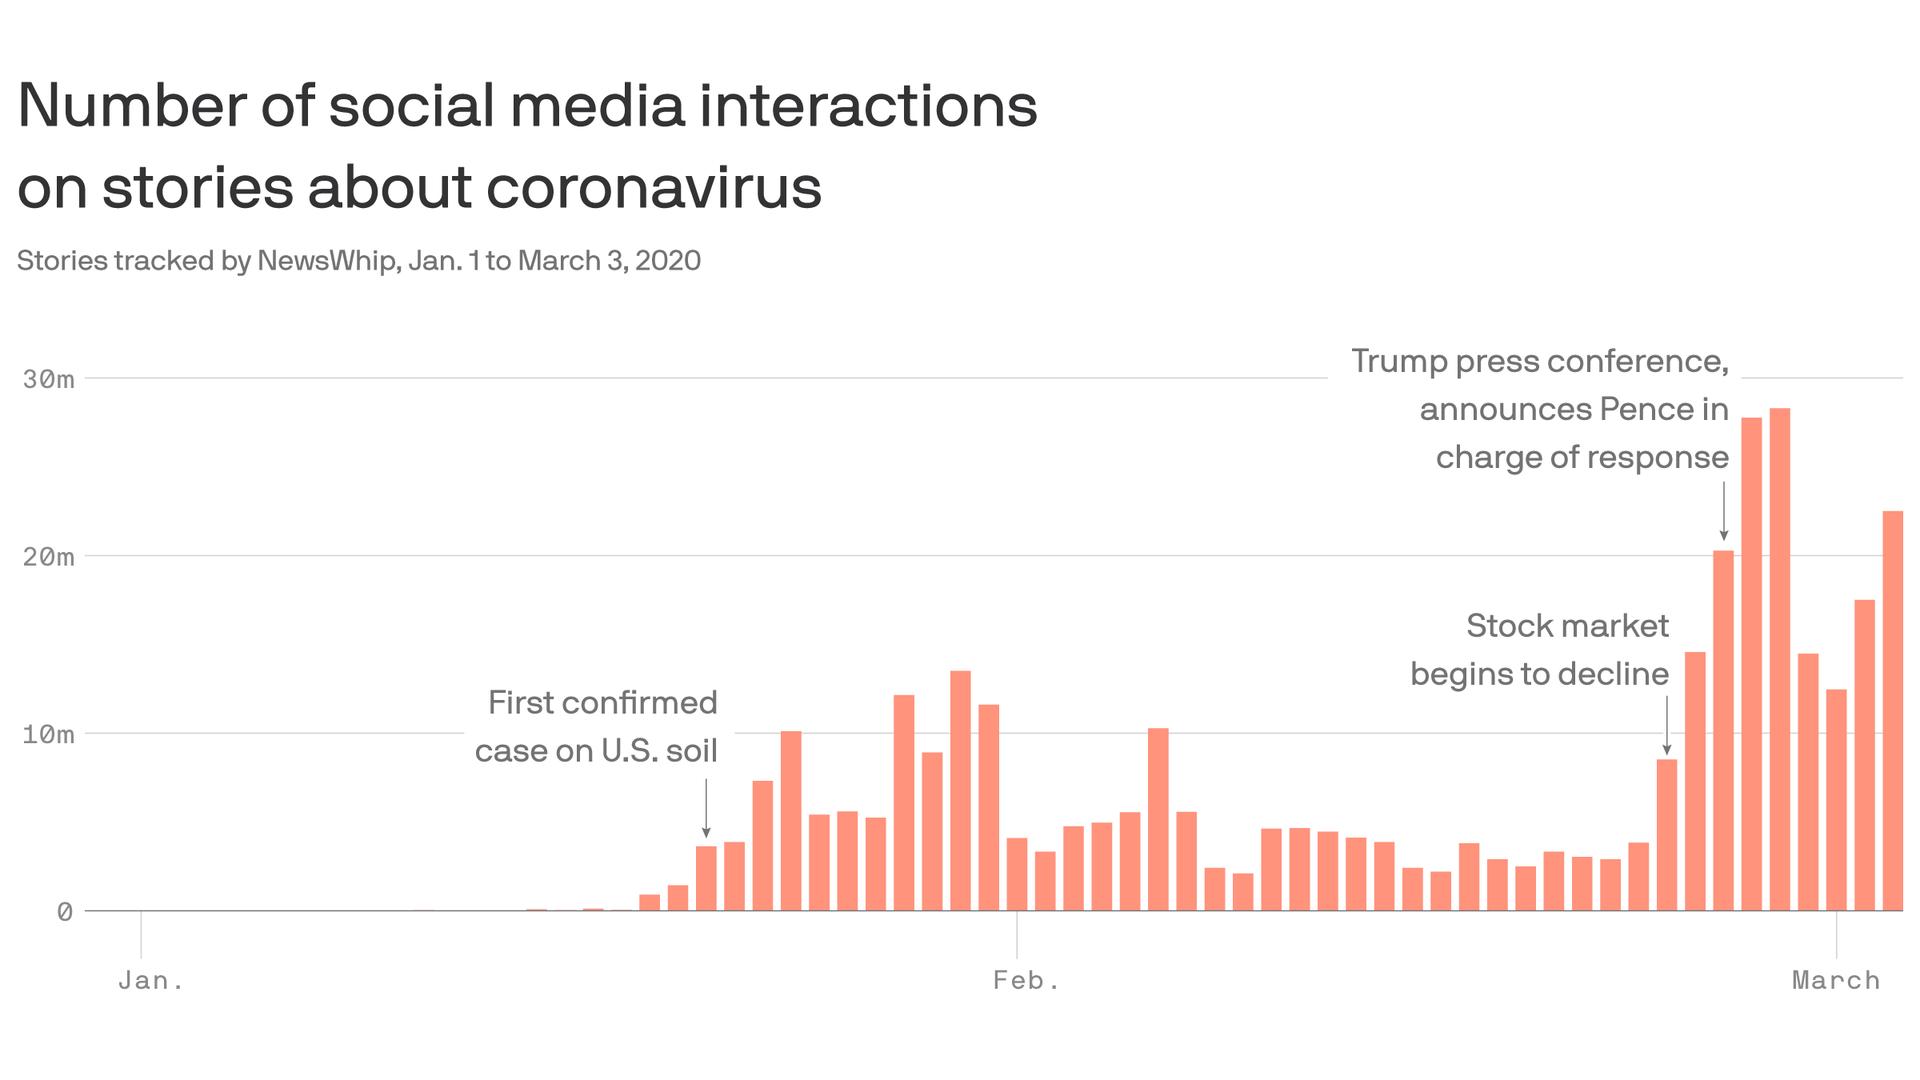 Coronavirus panic sells as alarmist information flies on social media